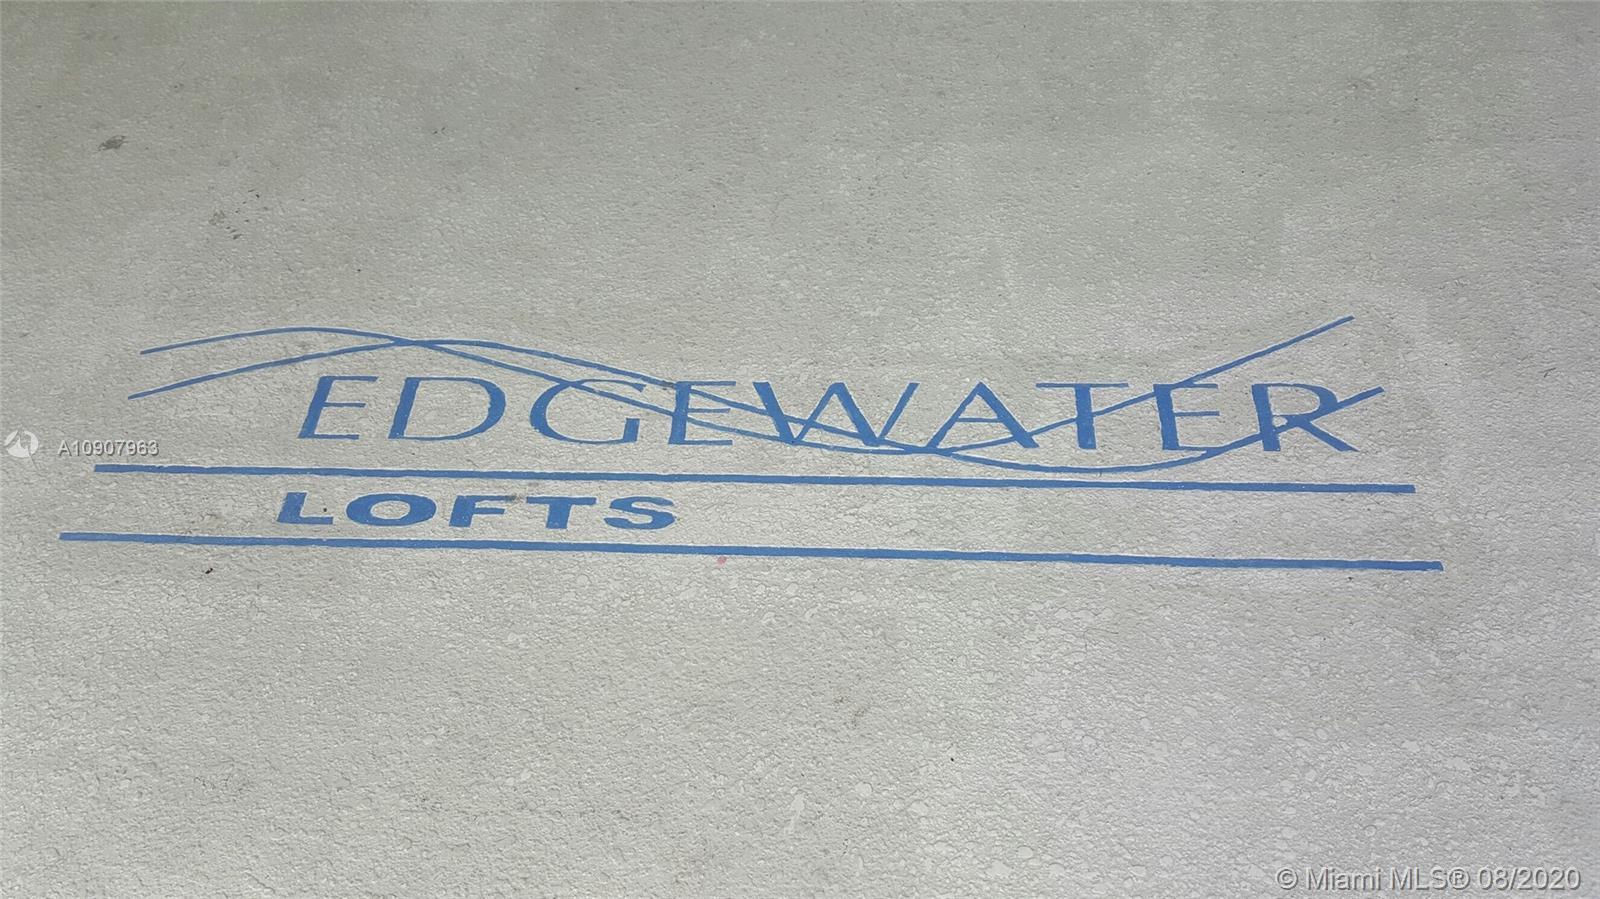 Edgewater Lofts image #3